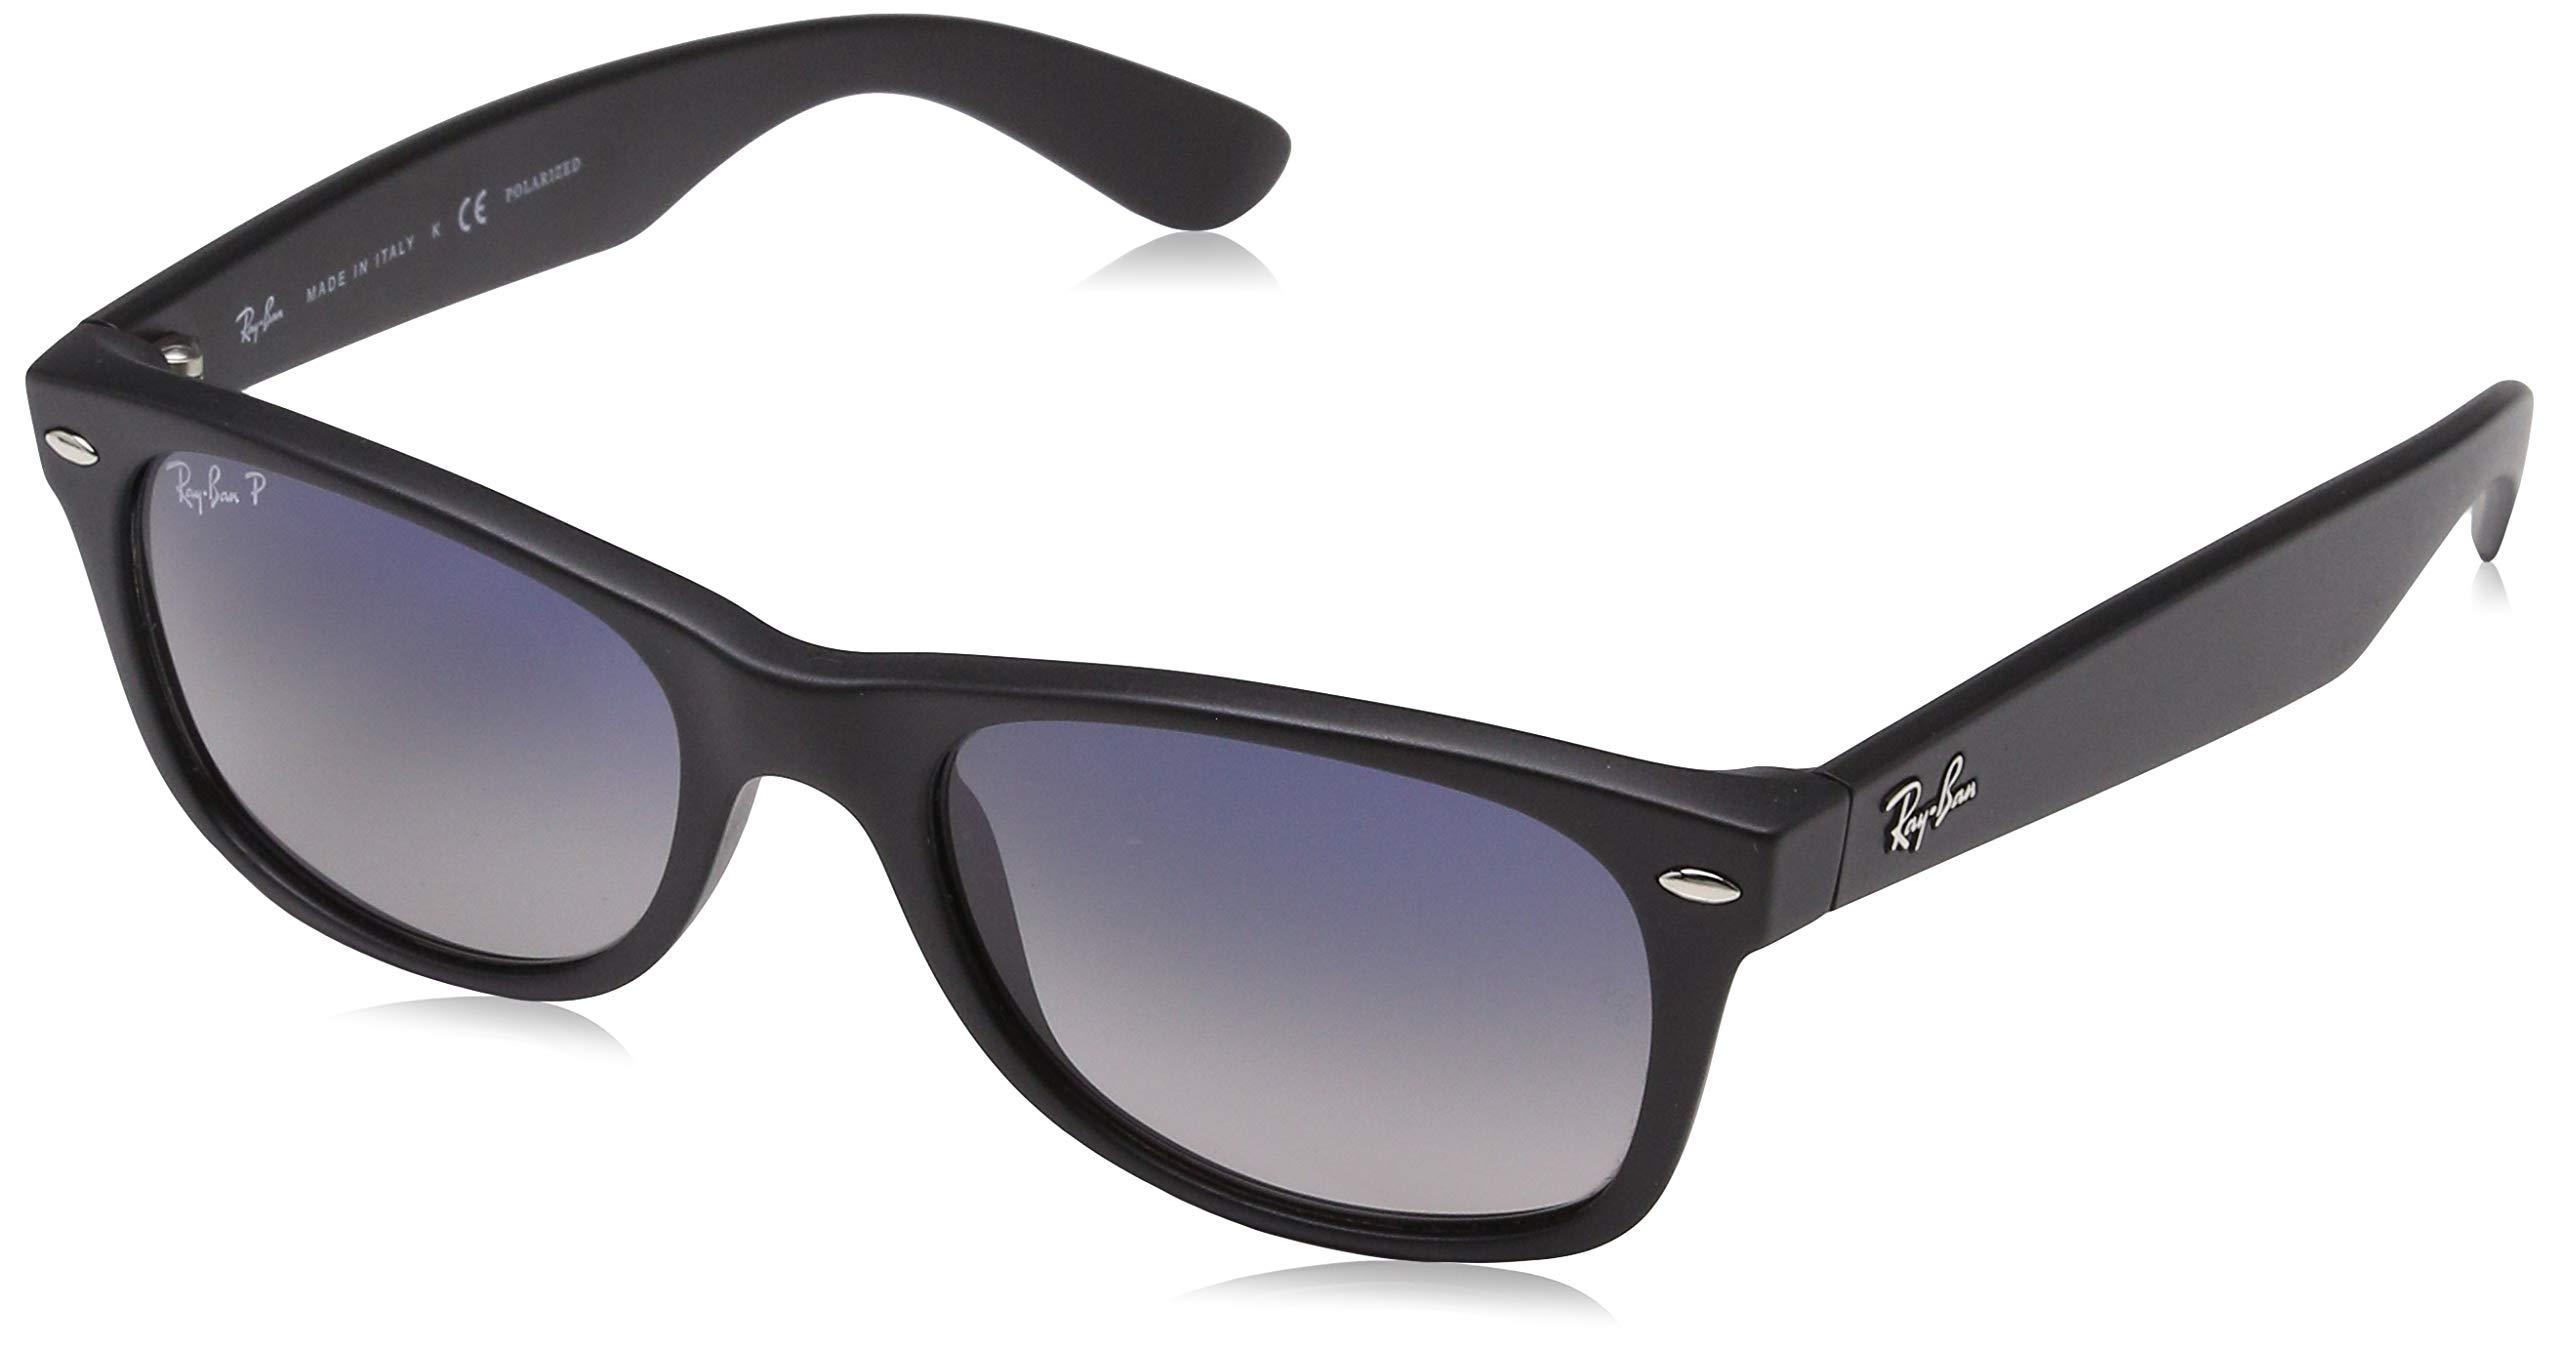 Ray-Ban Unisex New Wayfarer Polarized Sunglasses, Black/Polarized Blue/Grey Gradient, Blue Gradient Grey, 55mm by RAY-BAN